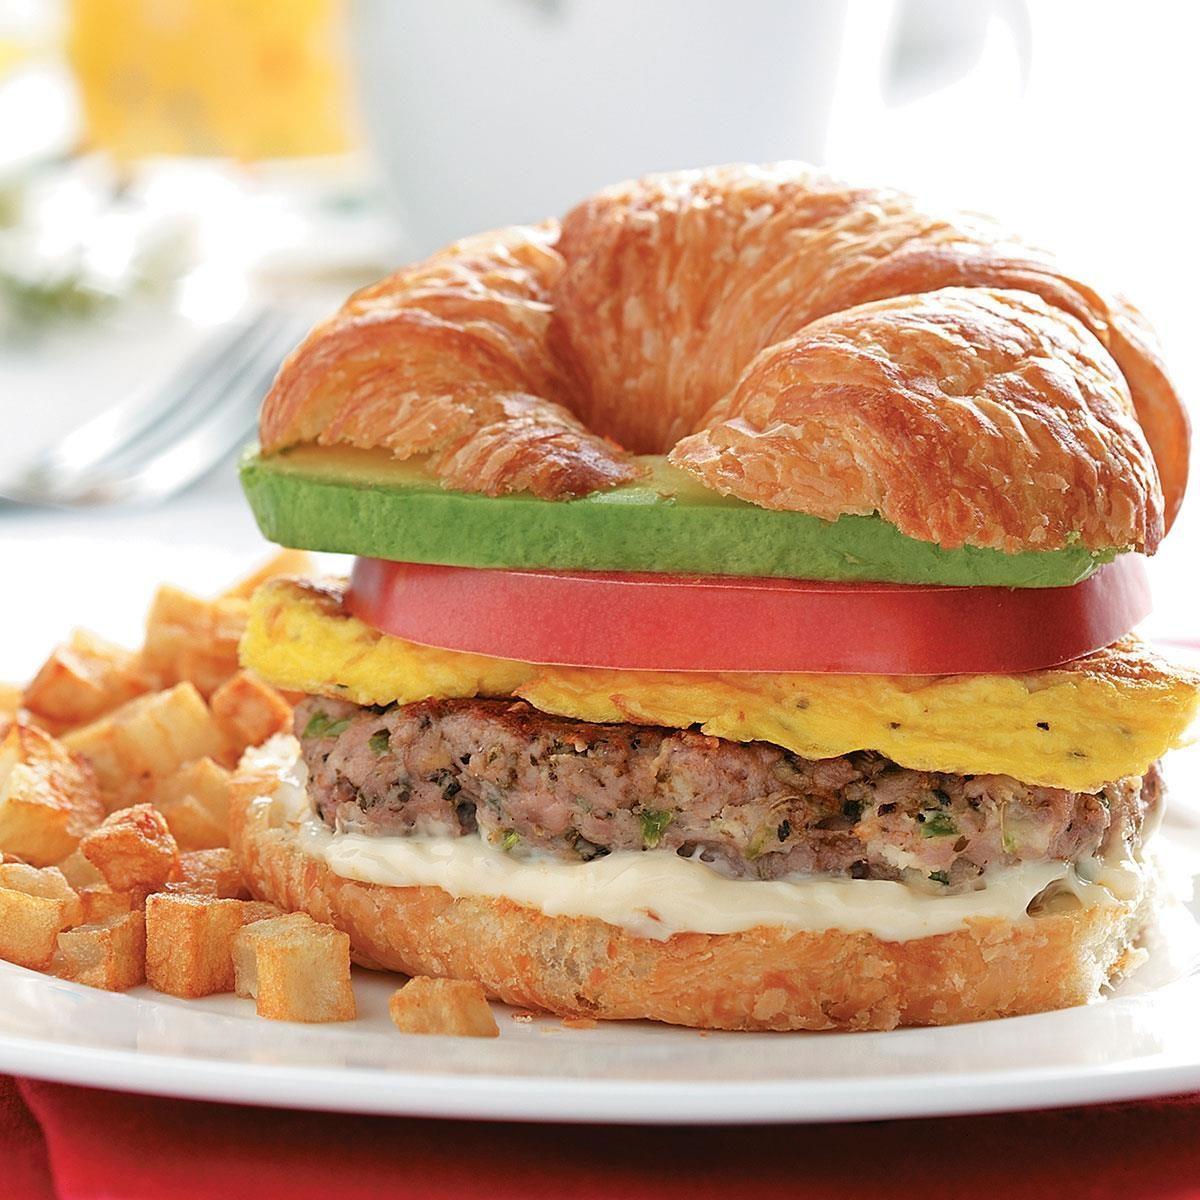 Inspired By: Starbucks Sausage, Cheddar & Egg Breakfast Sandwich